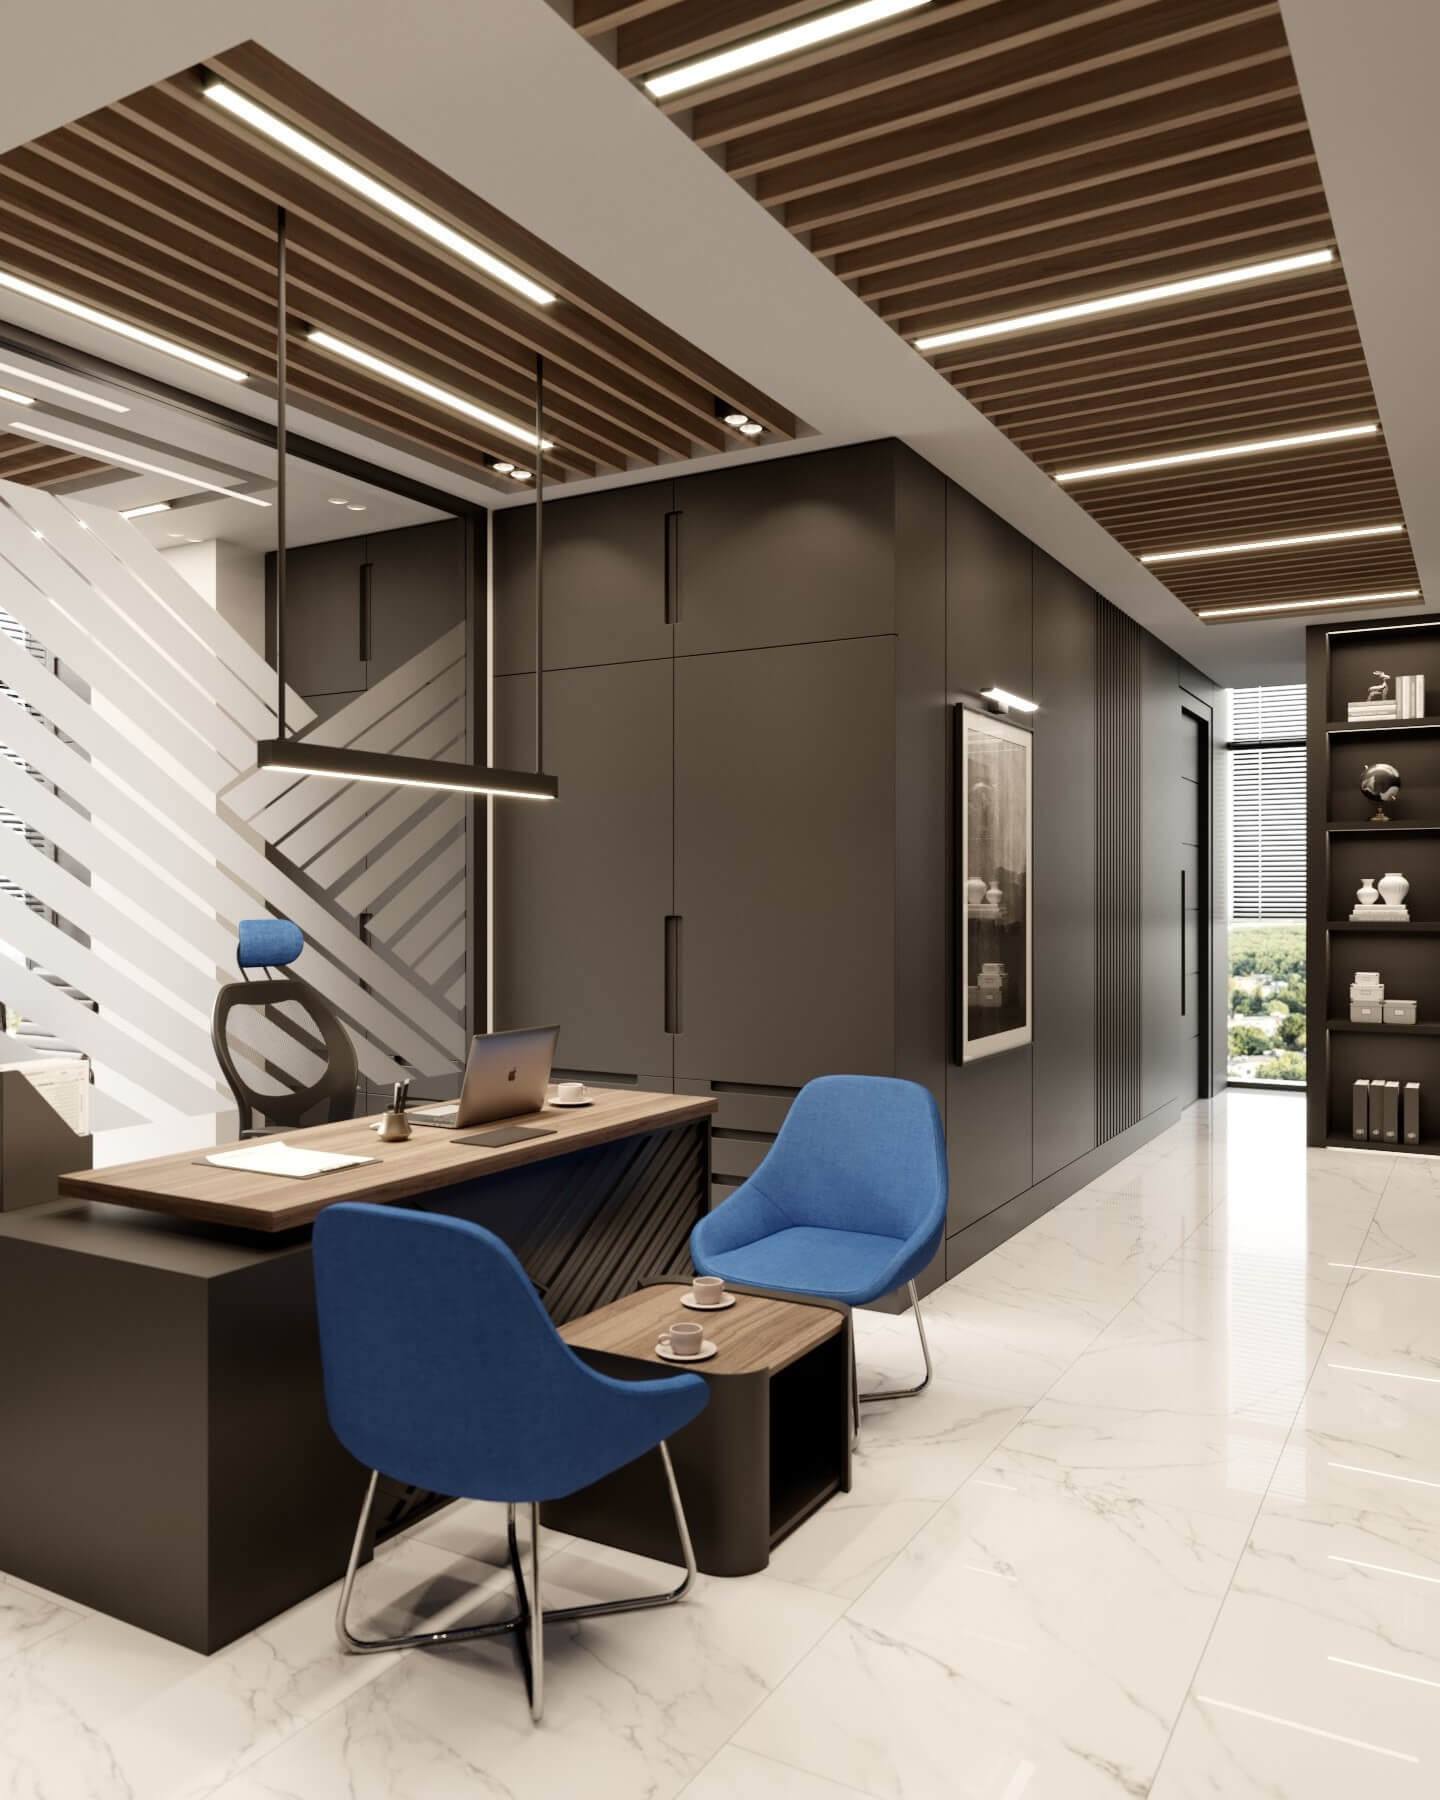 ofis içmimari 4113 Altın Hayat Sigorta Ofisler